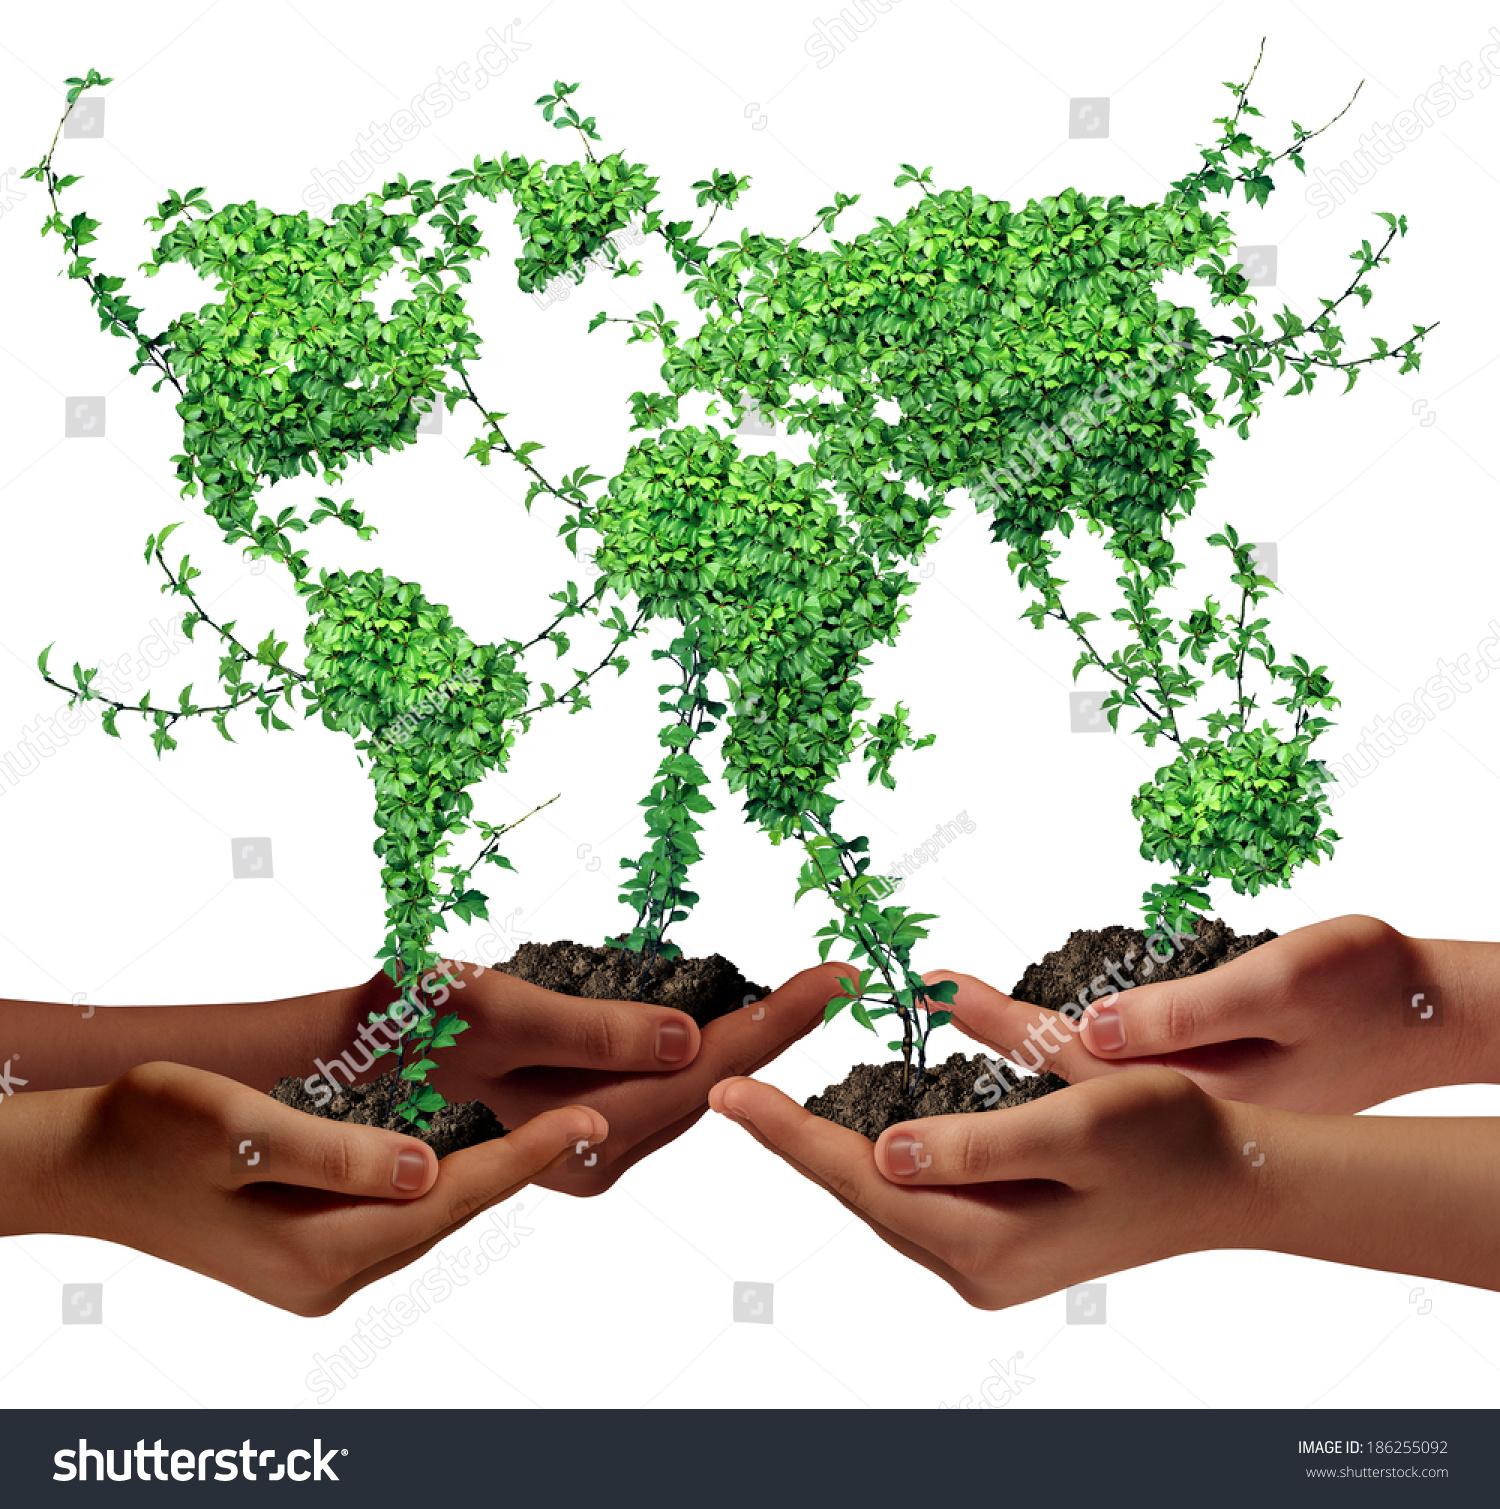 Environment Development Group 46